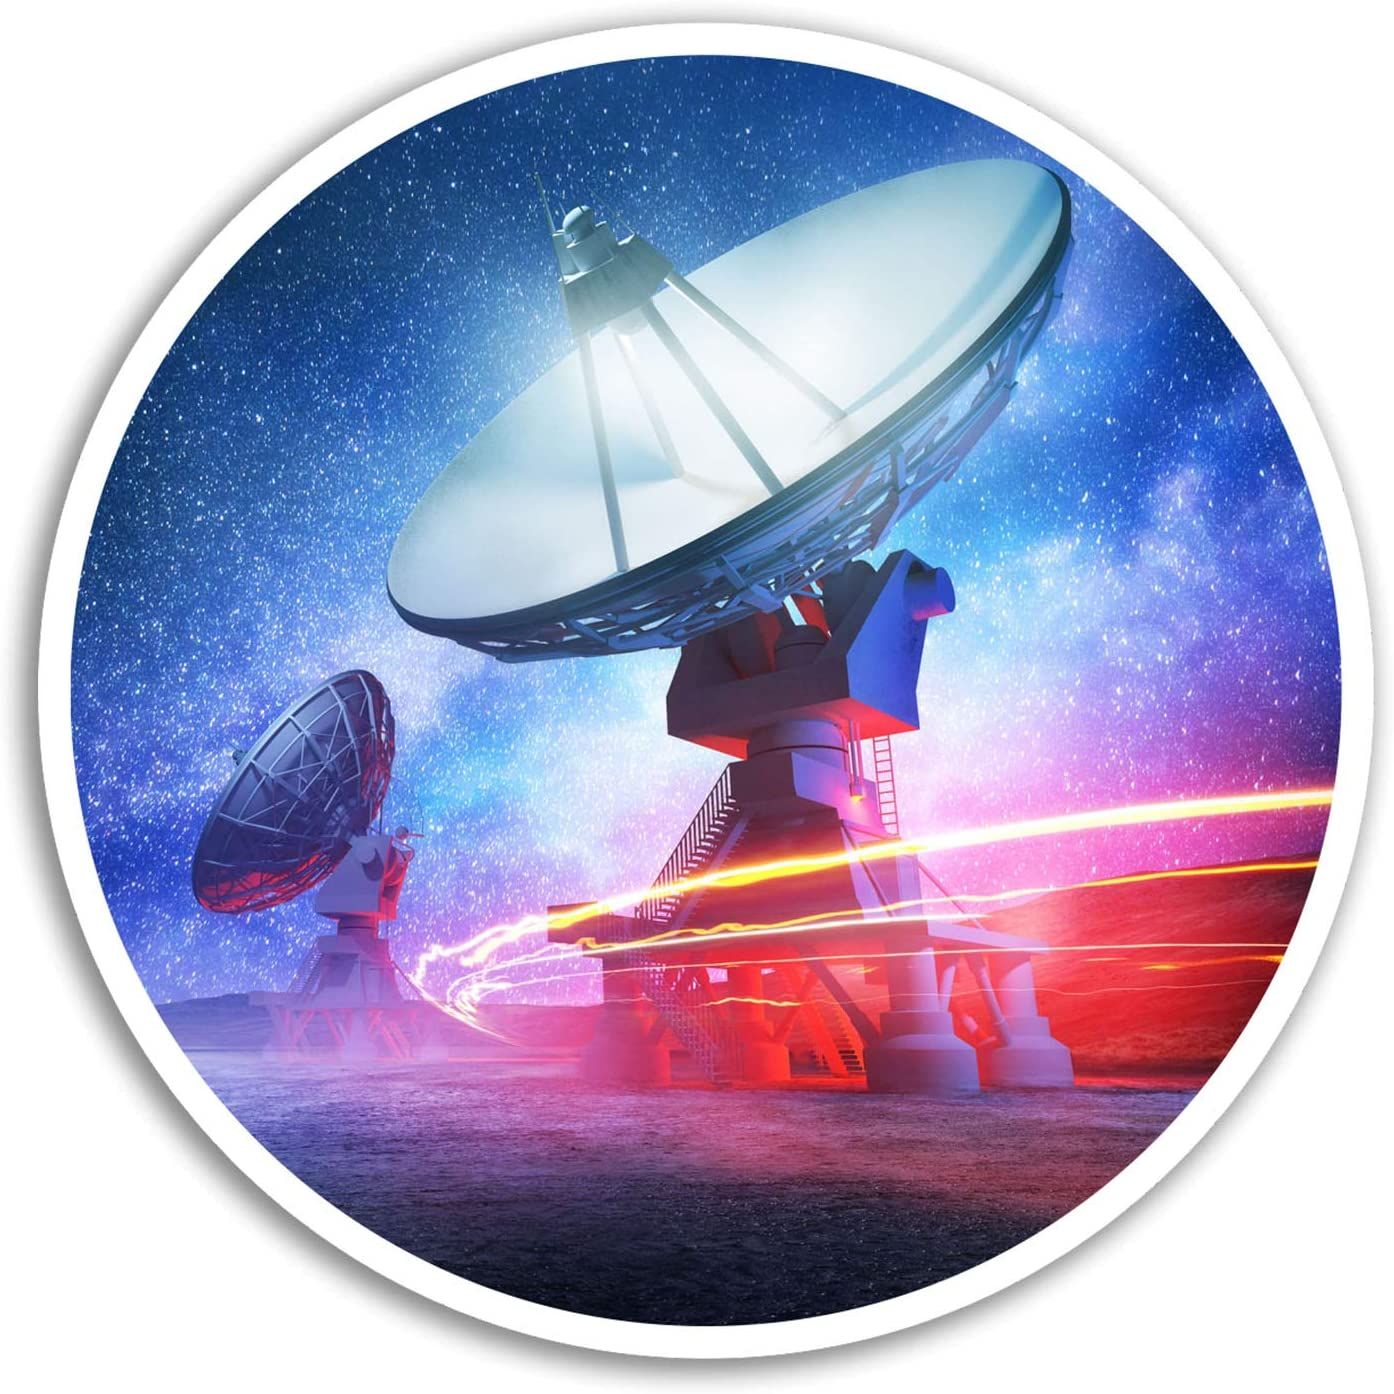 2 x 10cm Telescope Vinyl Stickers - Space Aliens Sticker Laptop Luggage #8216 (10cm Wide)